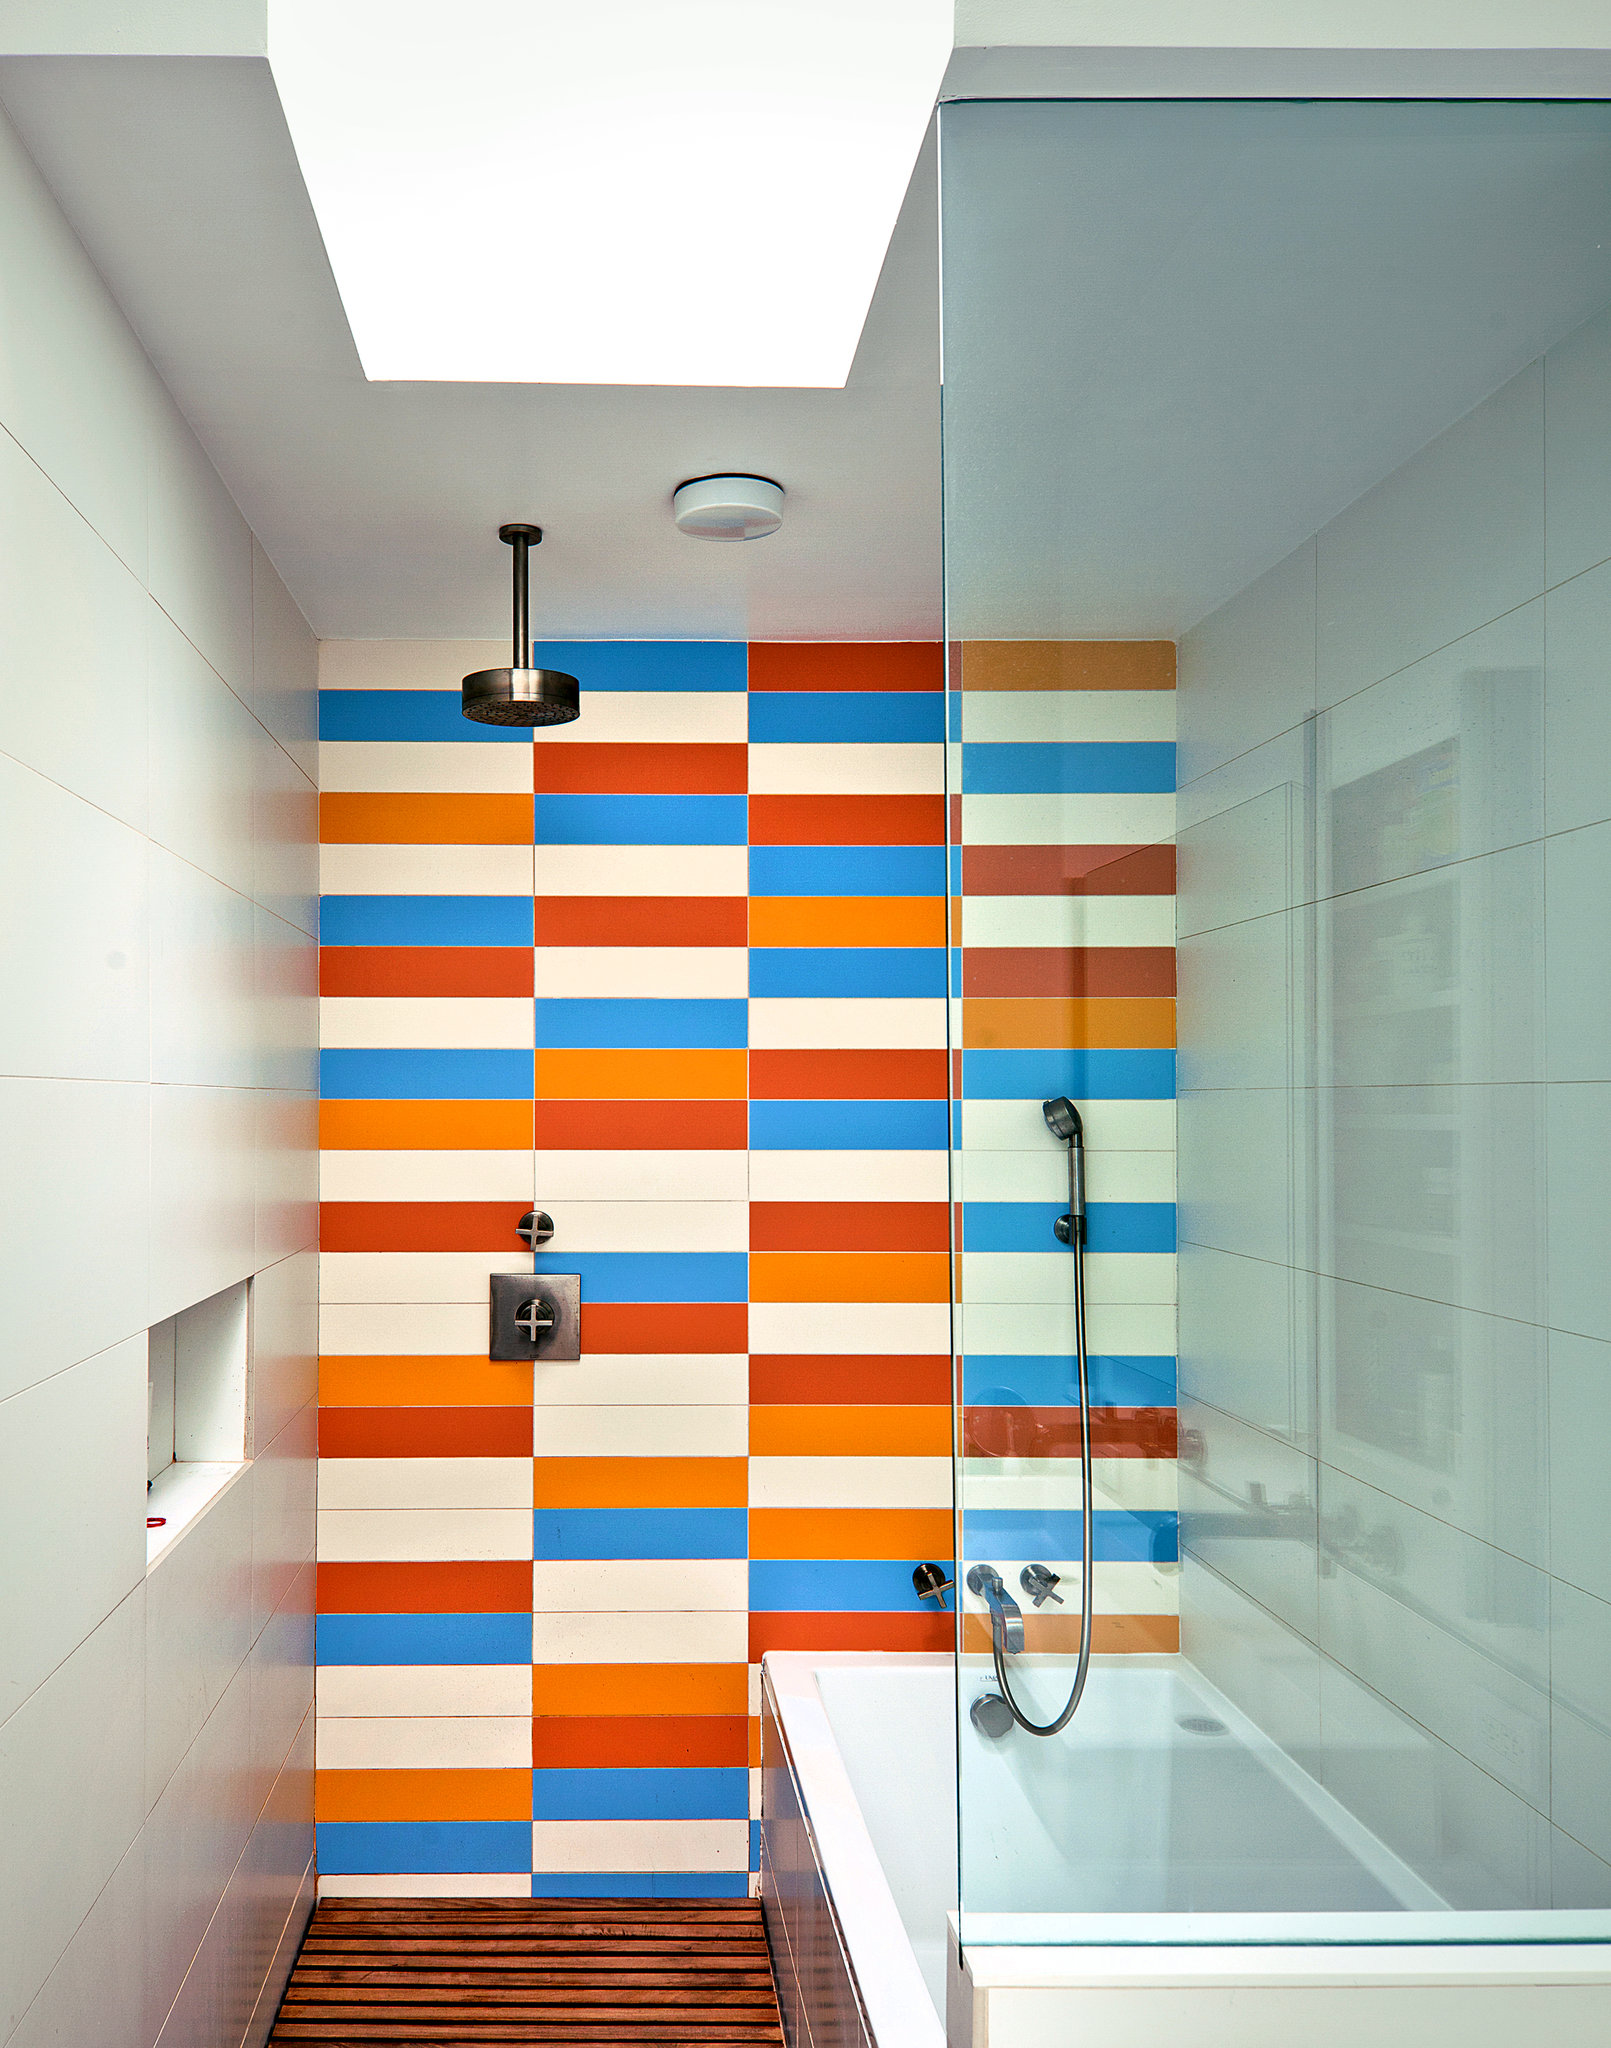 better shower curtain or glass door